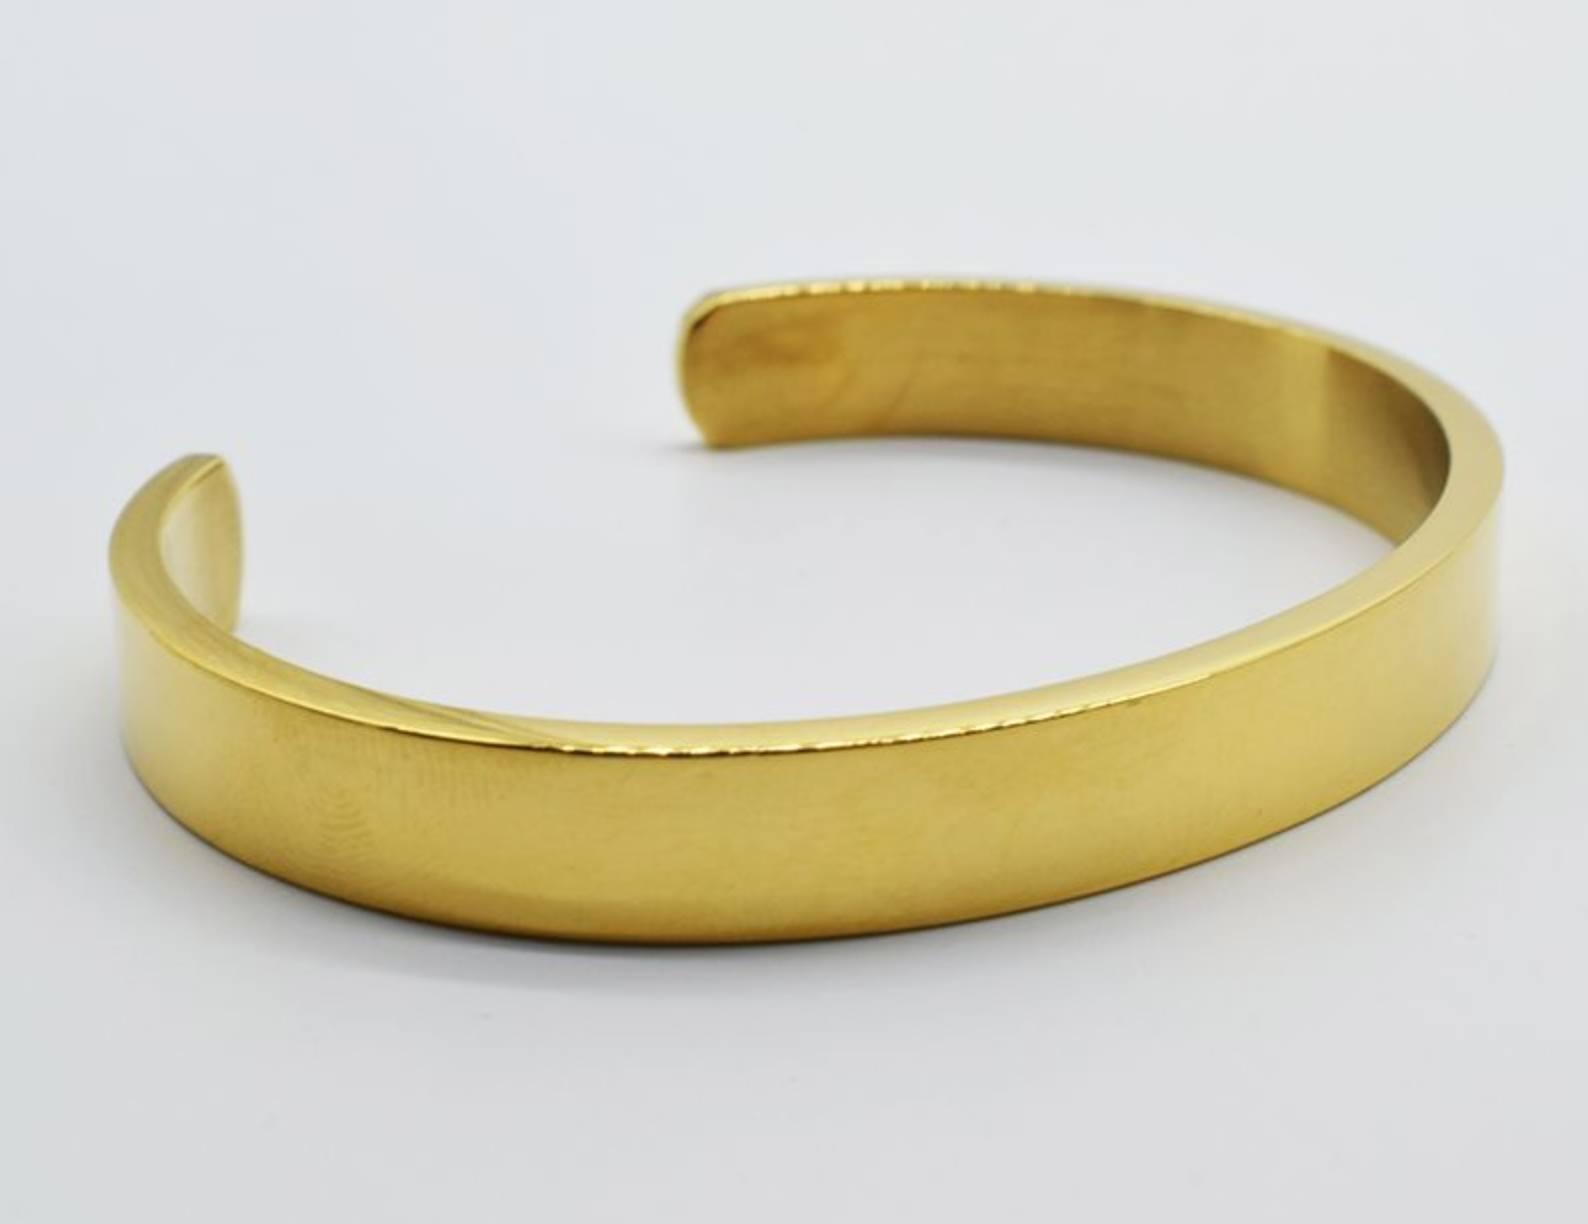 Golden Wrist Bangle